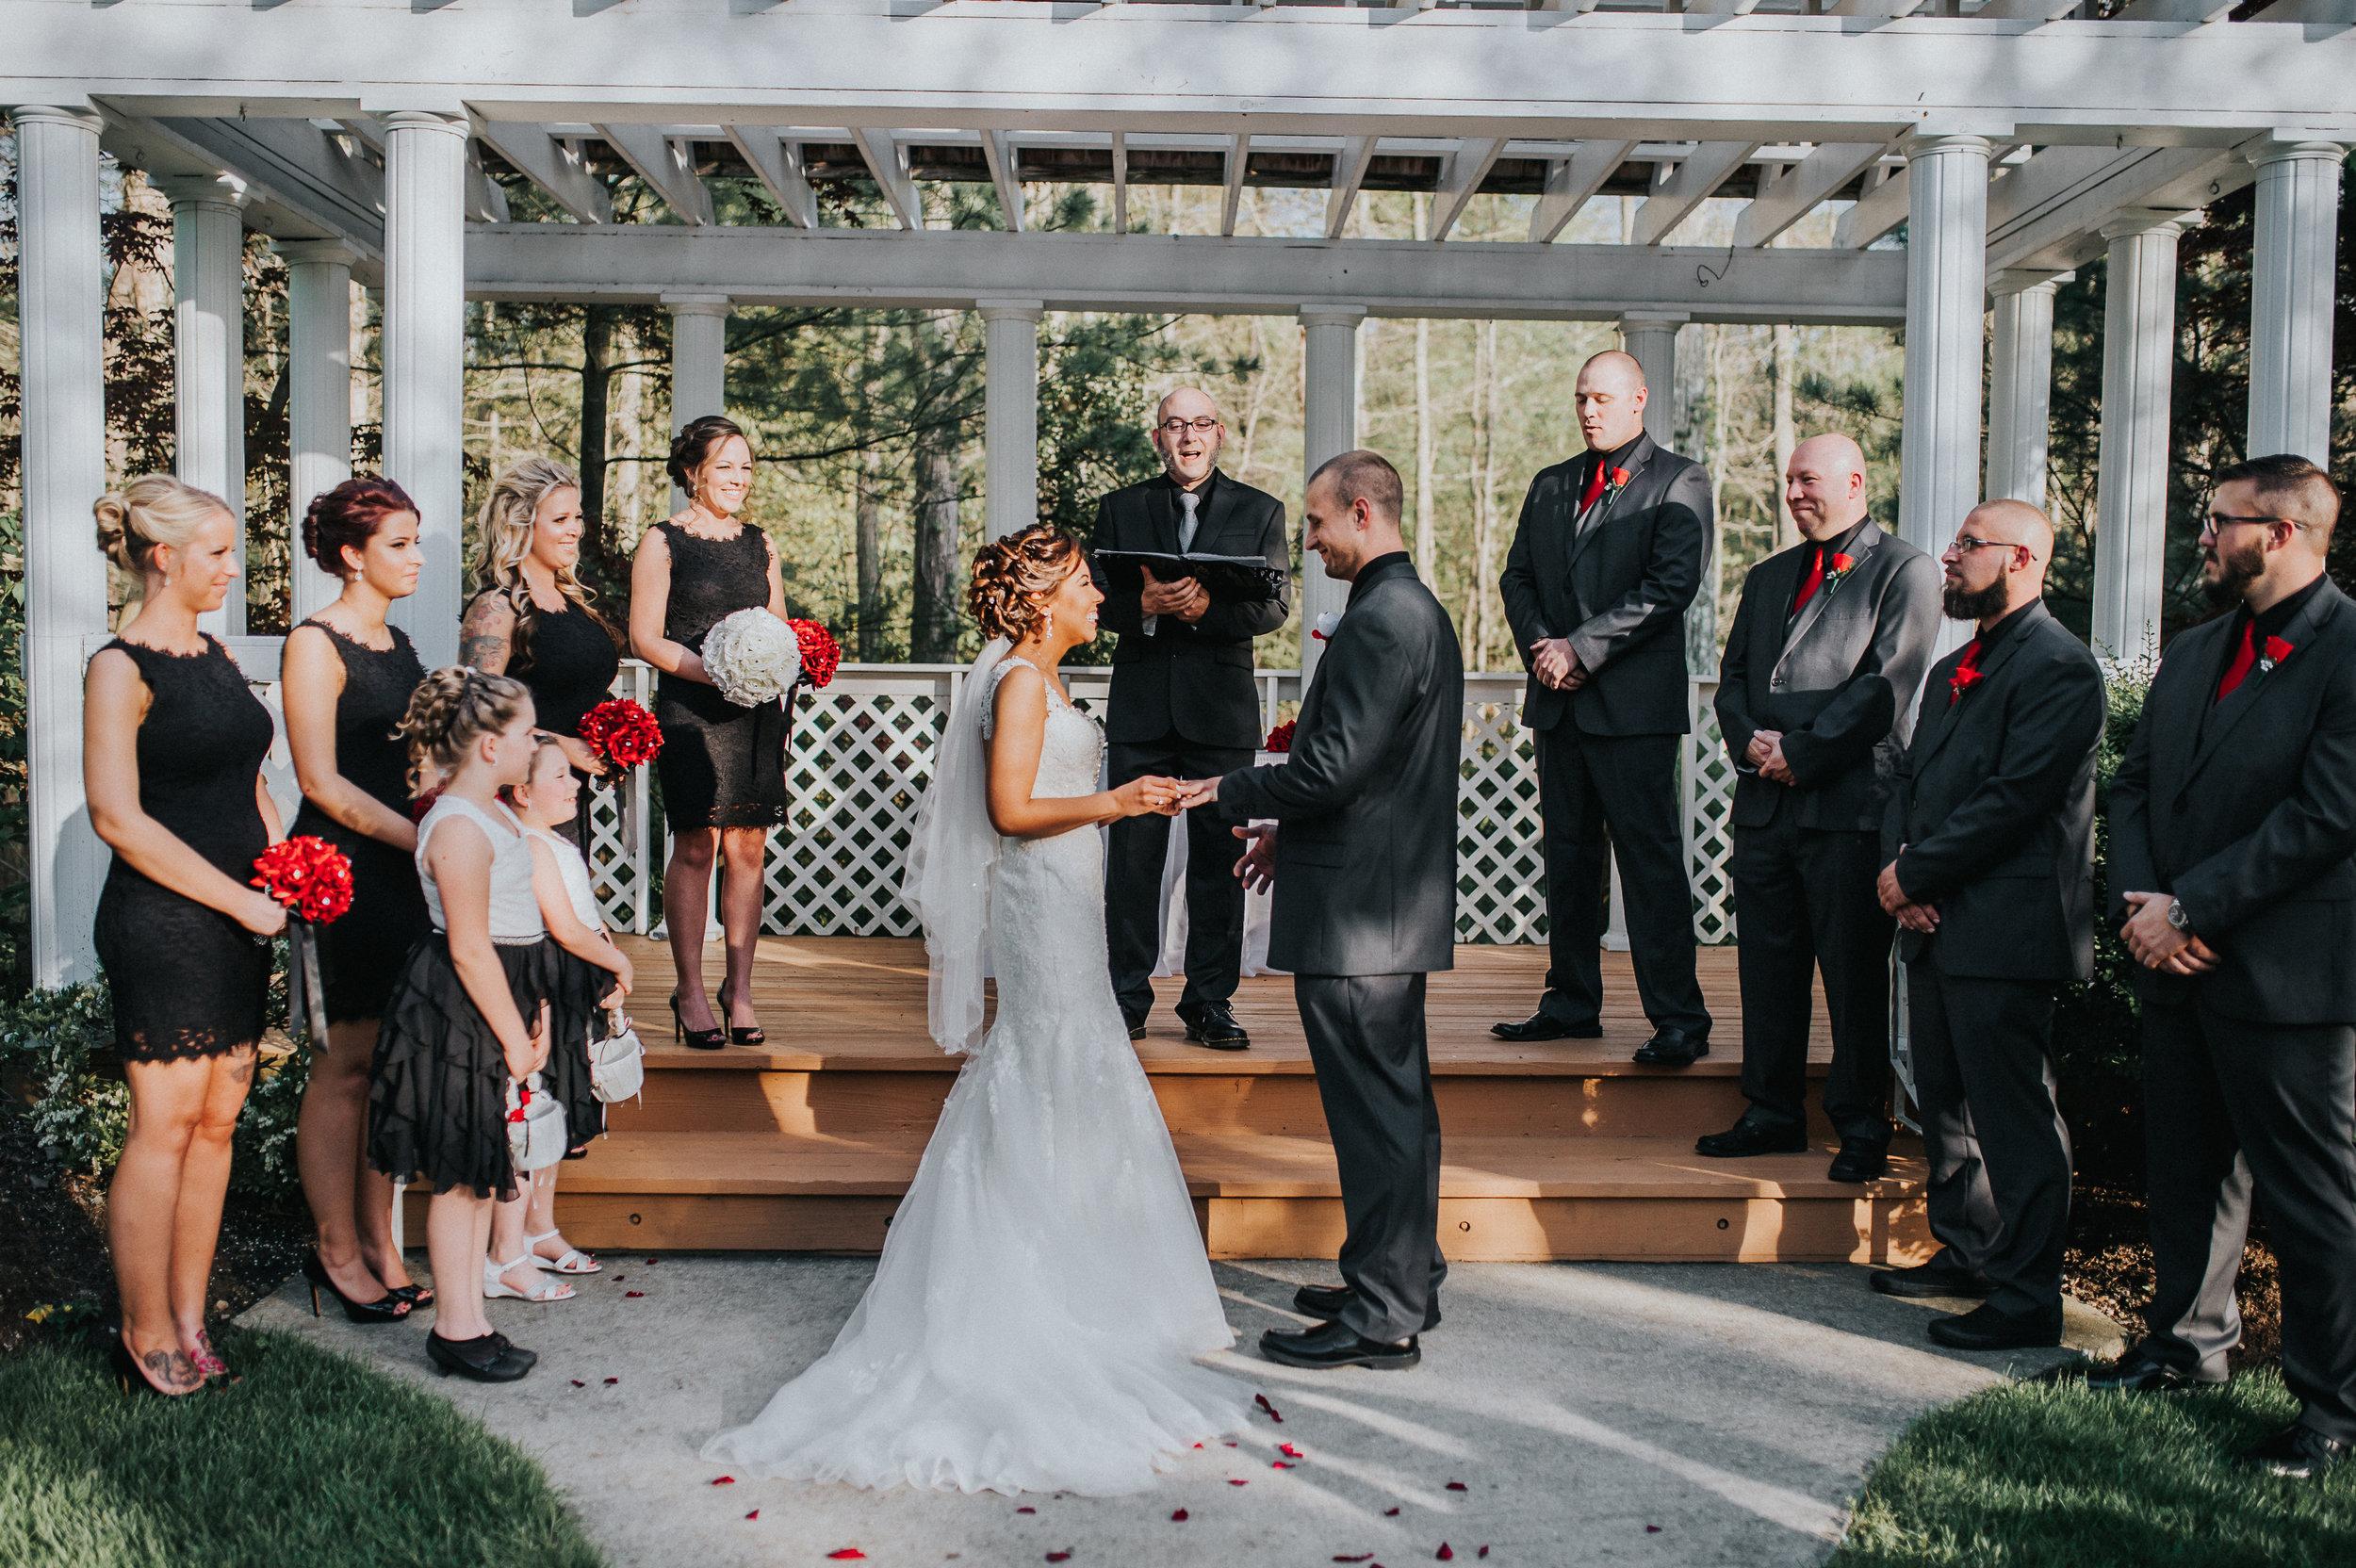 Christina-and-Gene-Wedding-Marla-Rain-Photography-336.jpg